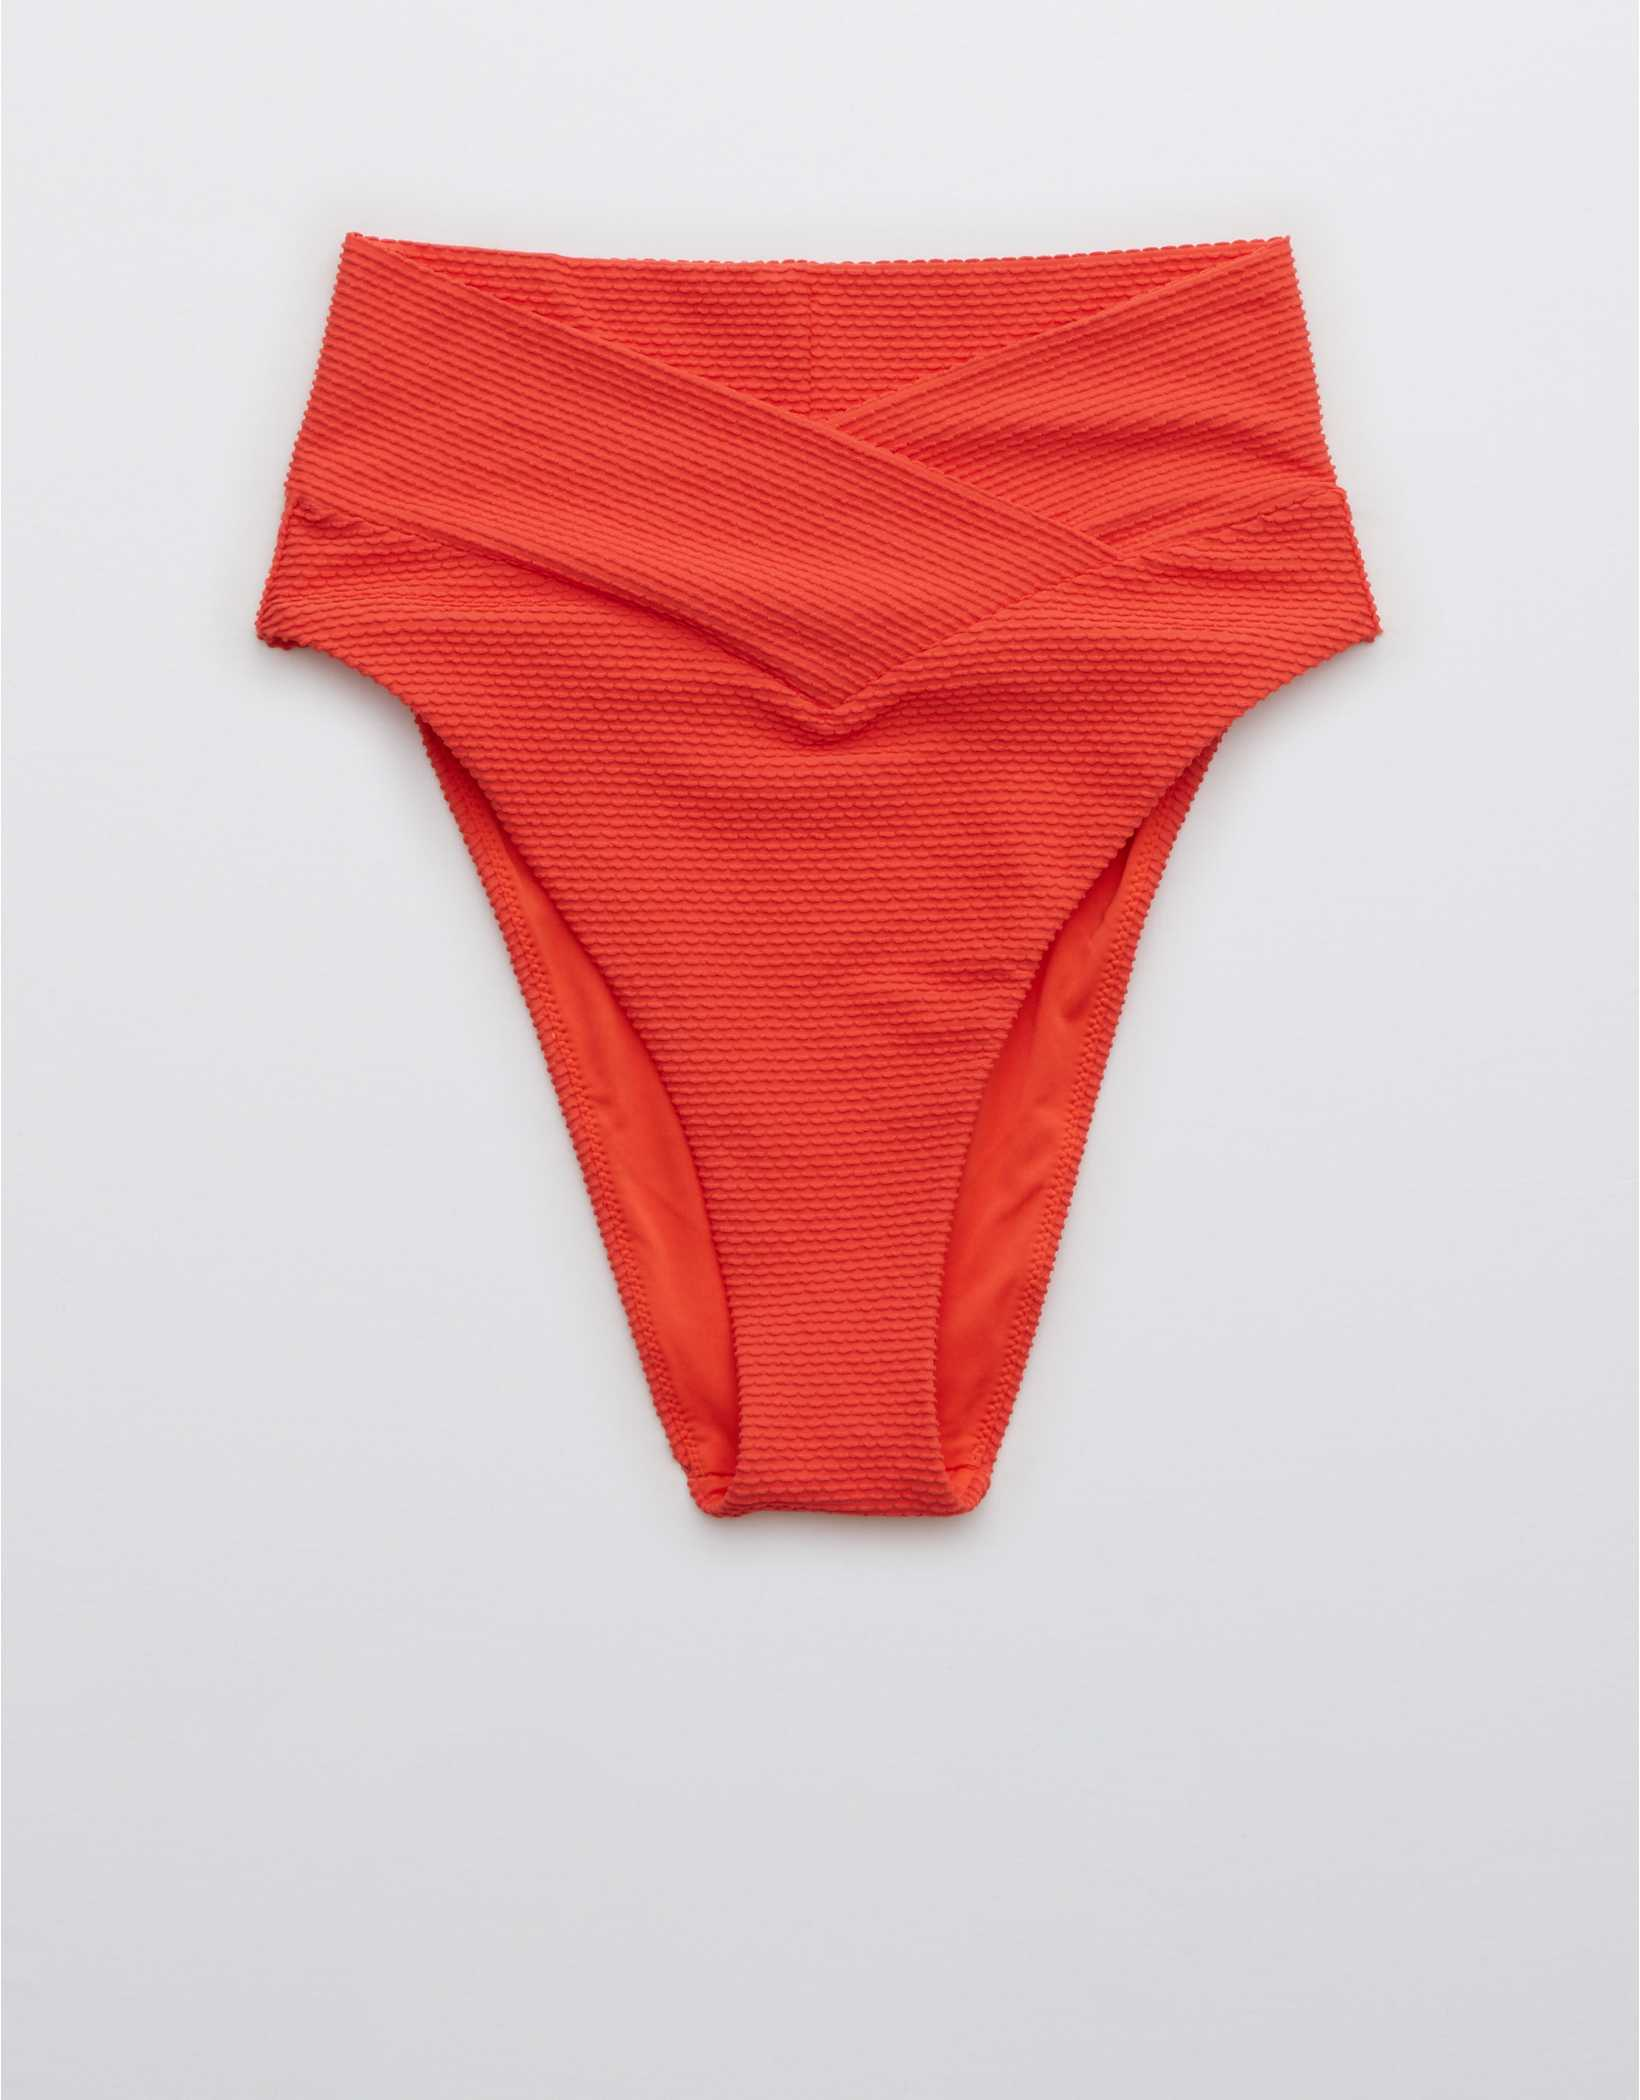 Aerie Textured Crossover High Cut Cheeky Bikini Bottom